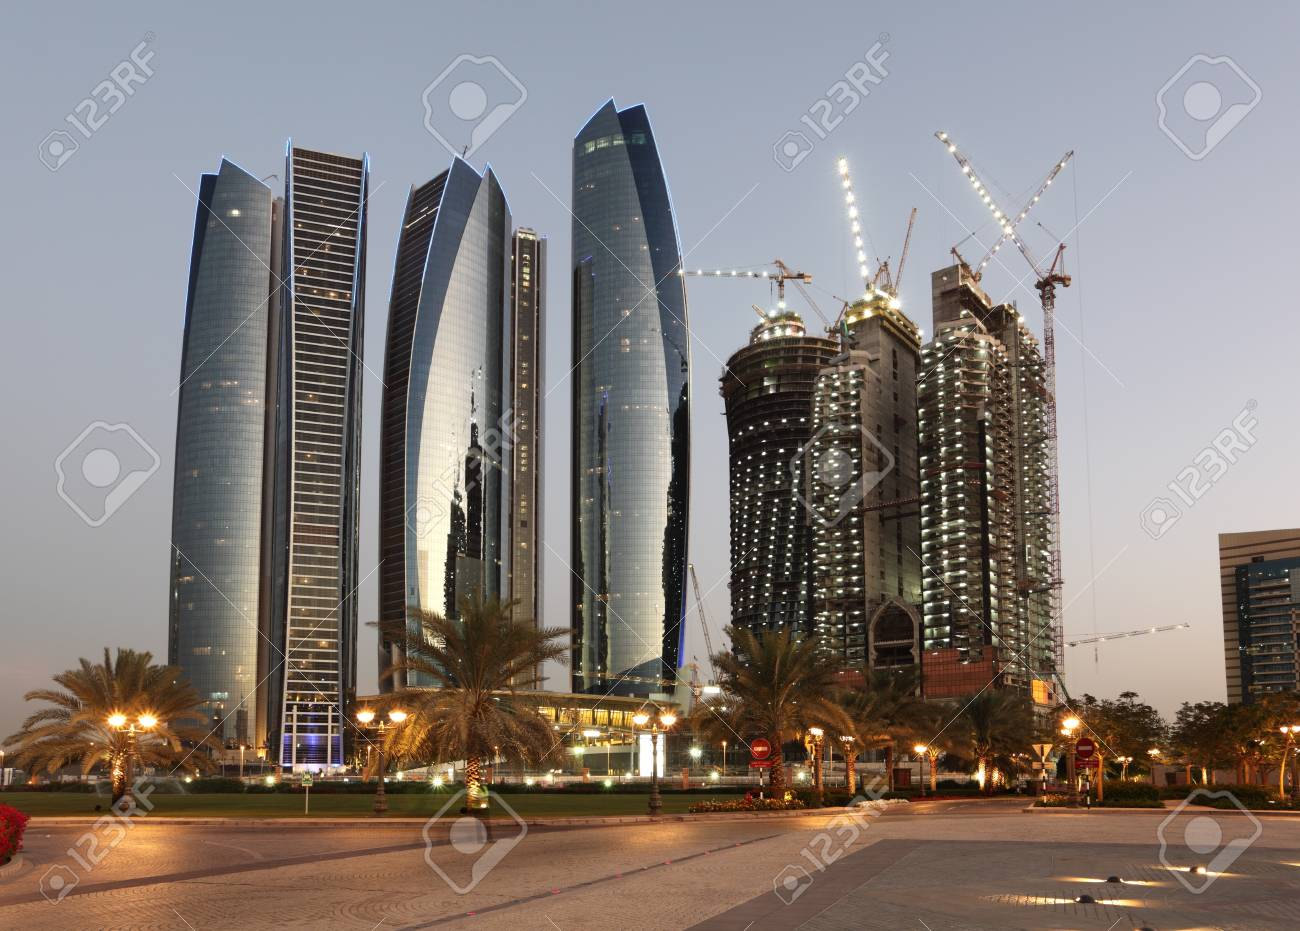 Skyscrapers in Abu Dhabi at dusk, United Arab Emirates Stock Photo - 15735306